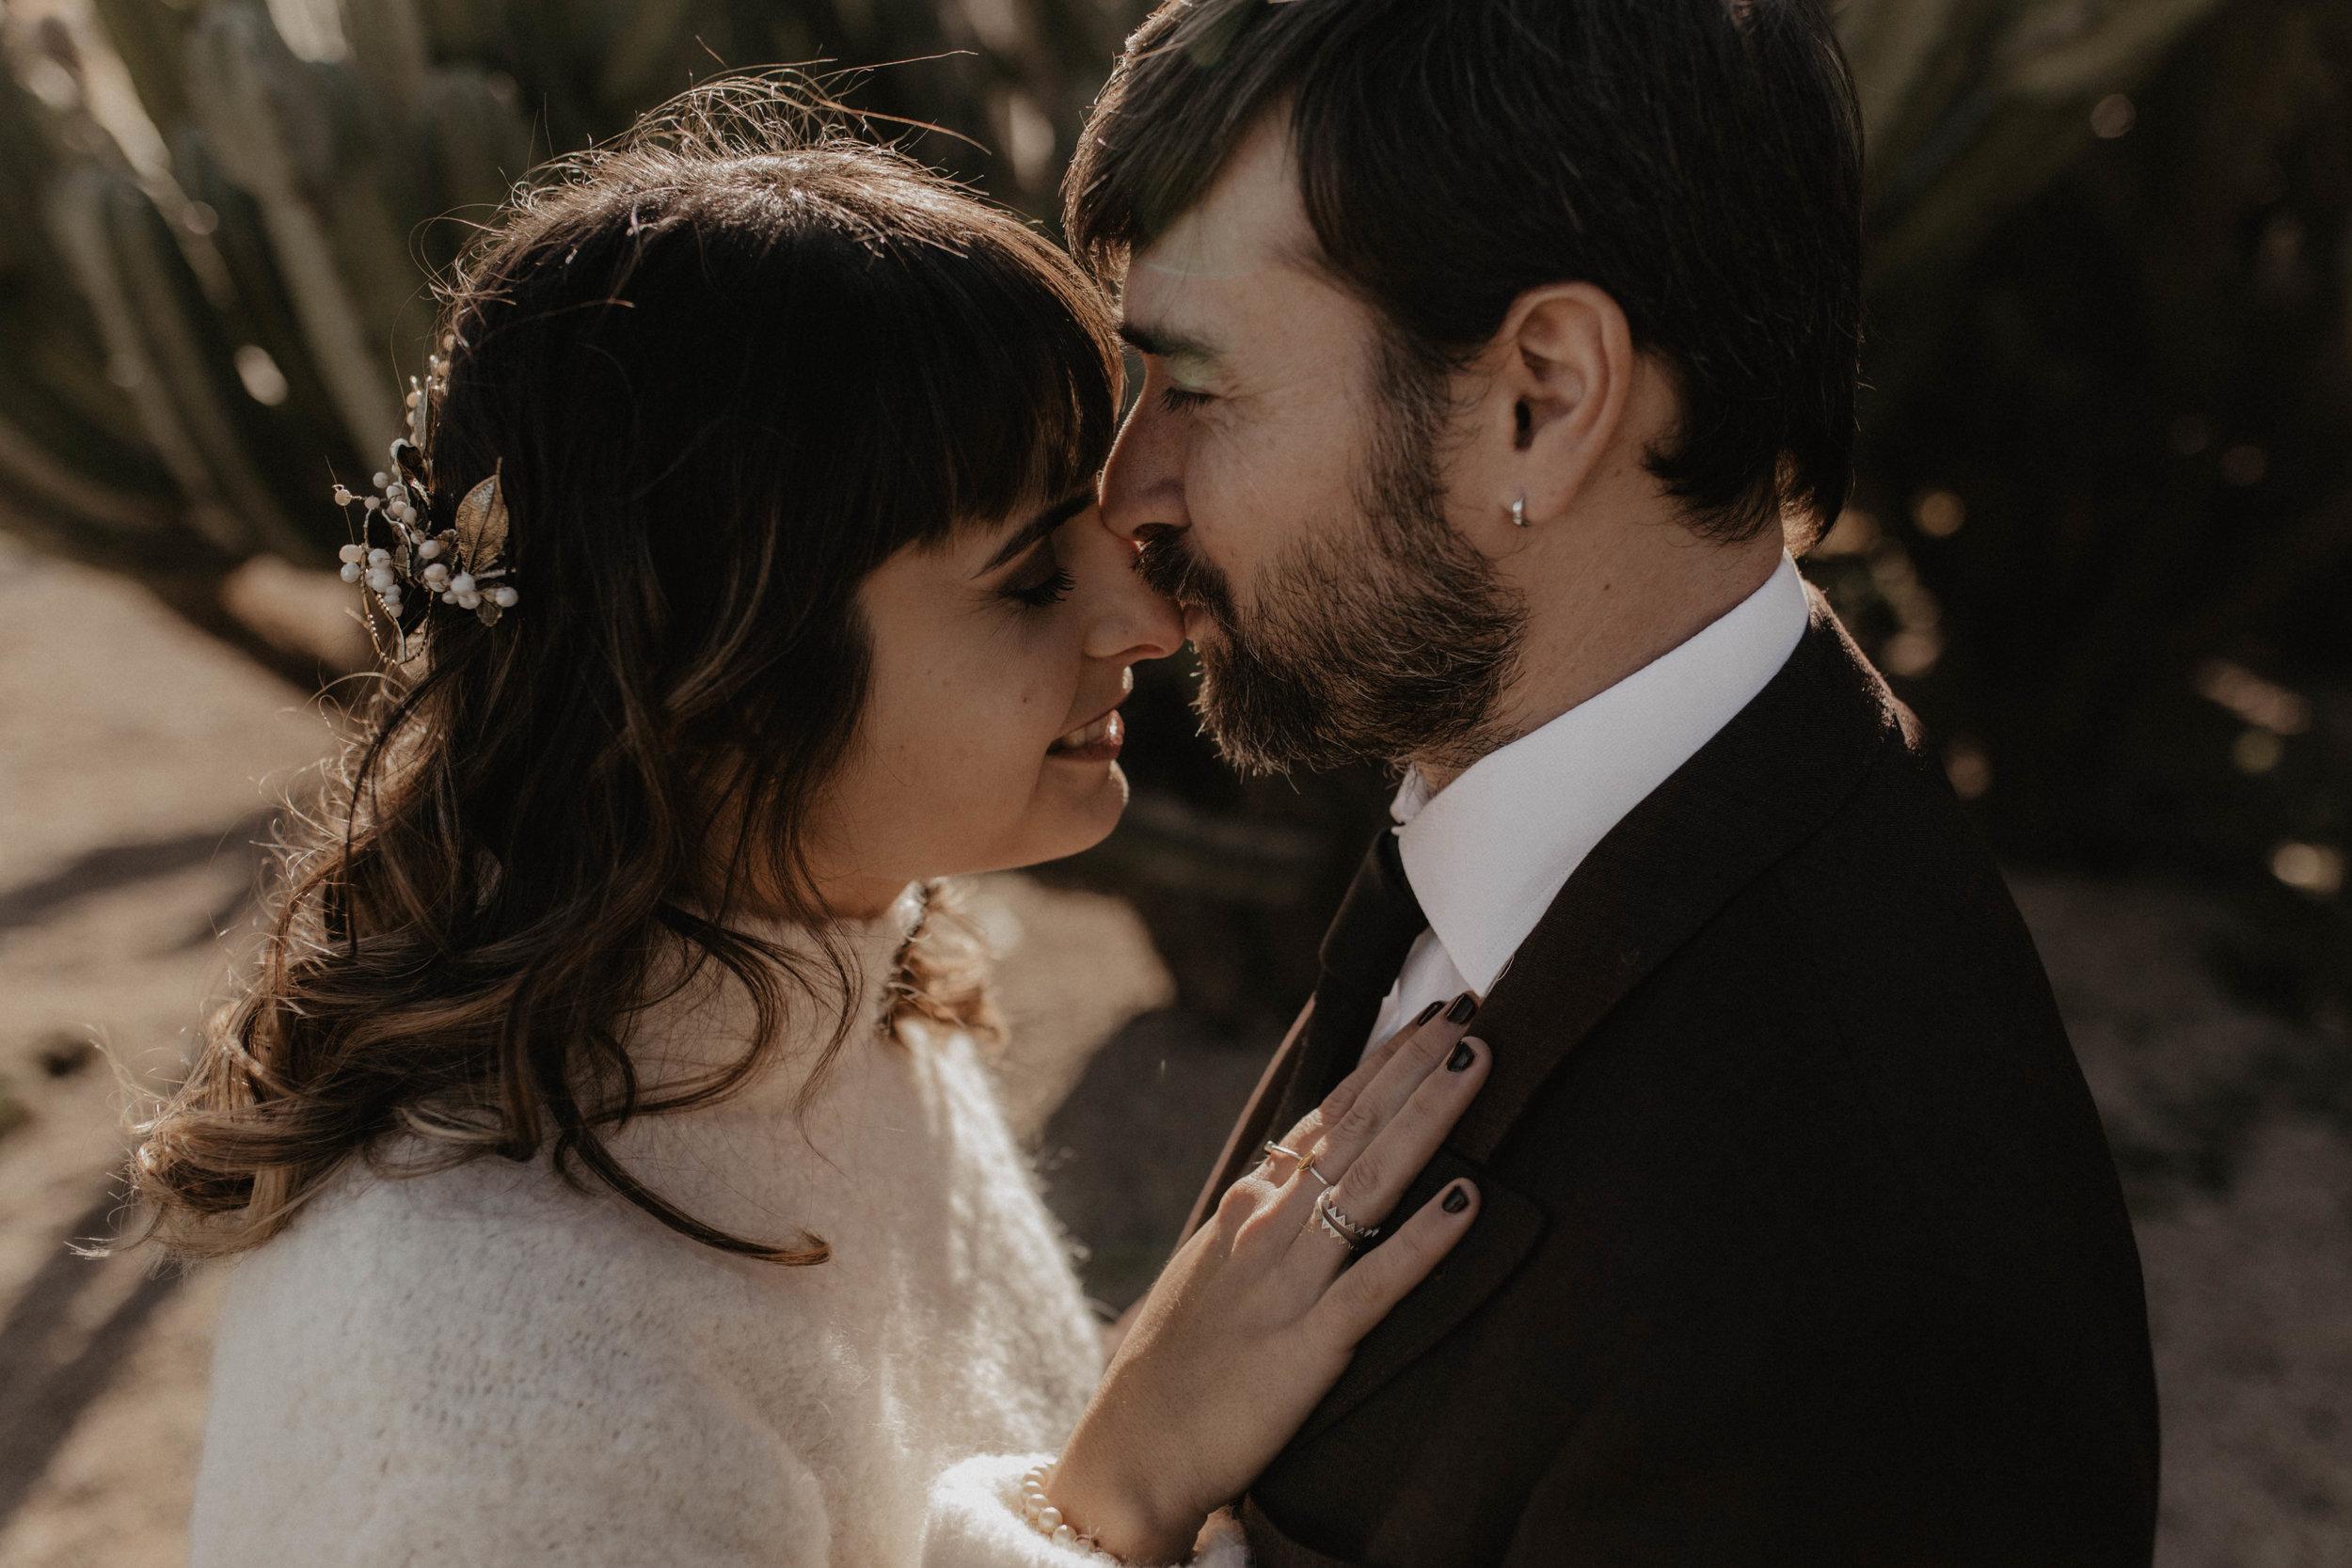 thenortherngirlphotography-photography-weddingphotography-couple-bodasconestilo-bodasenbarcelona-martadavid-294.jpg